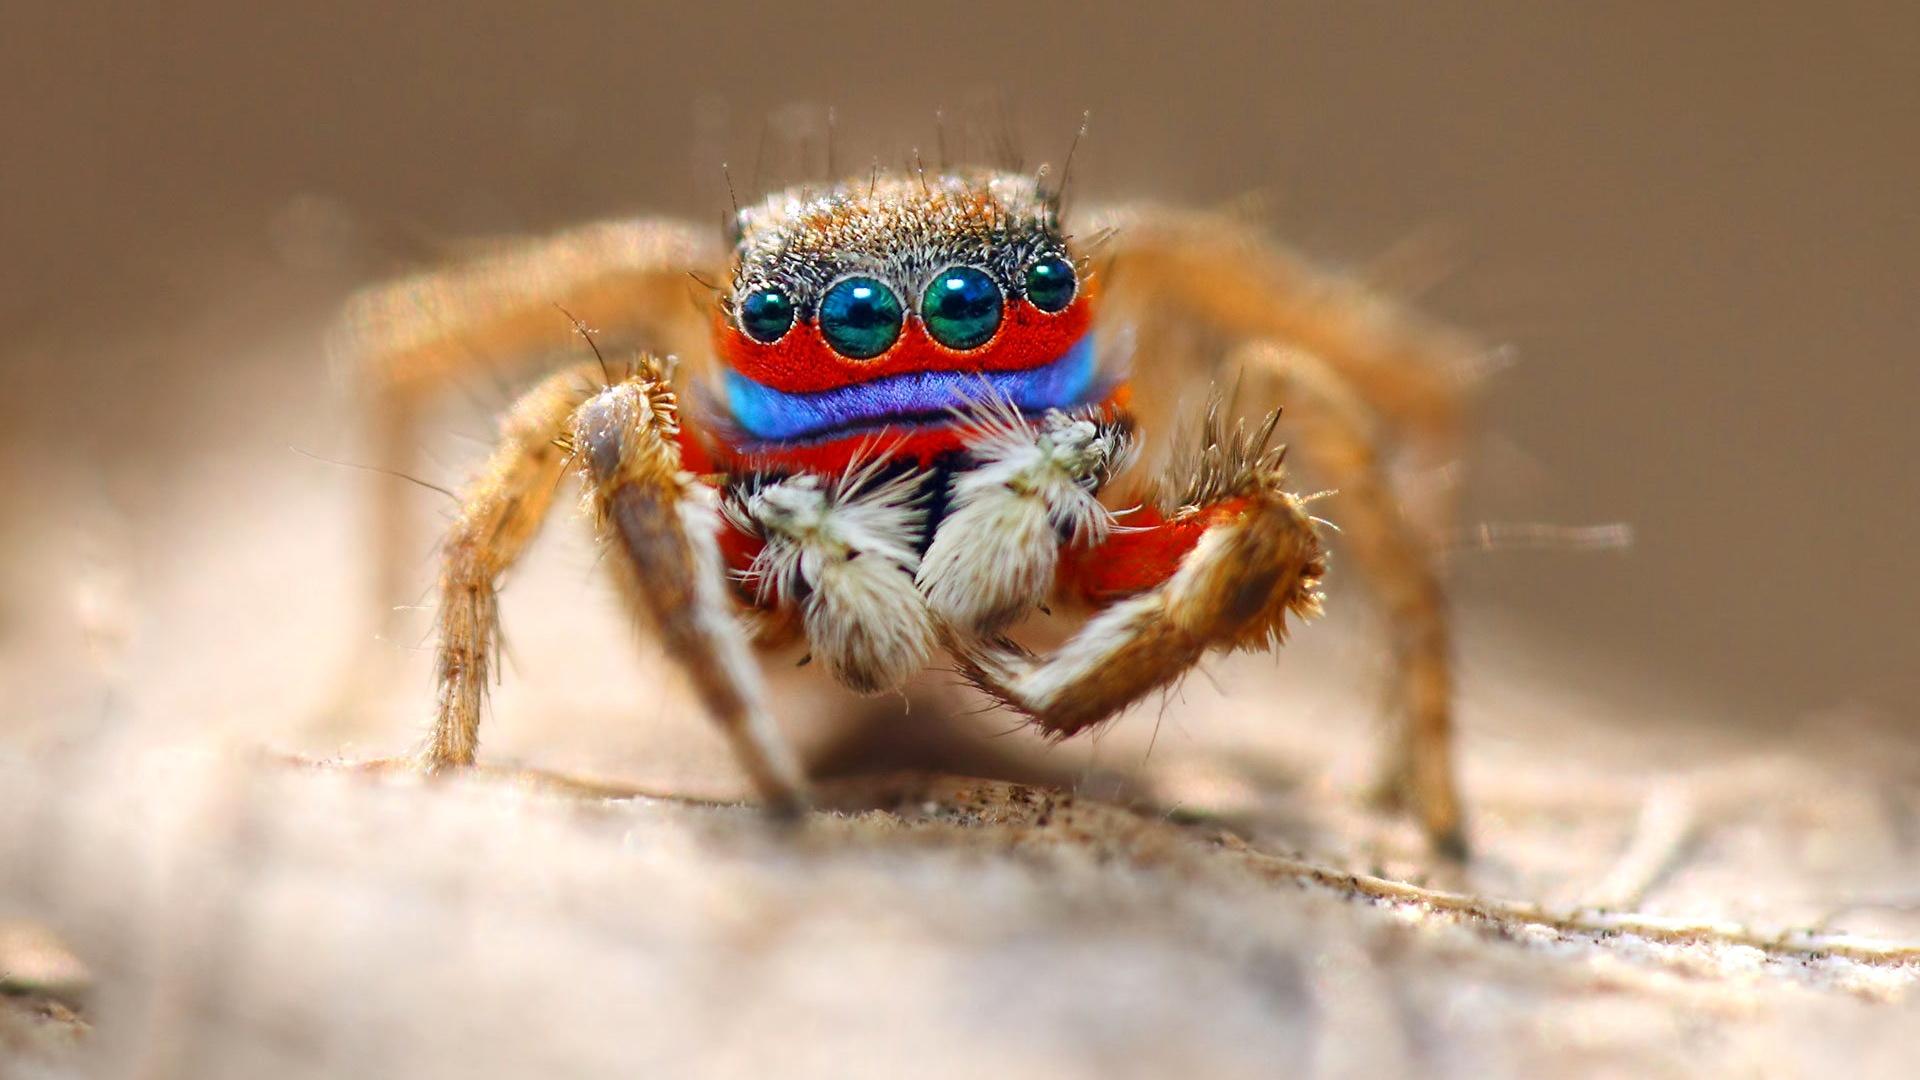 природа животные паук  № 2544186 без смс